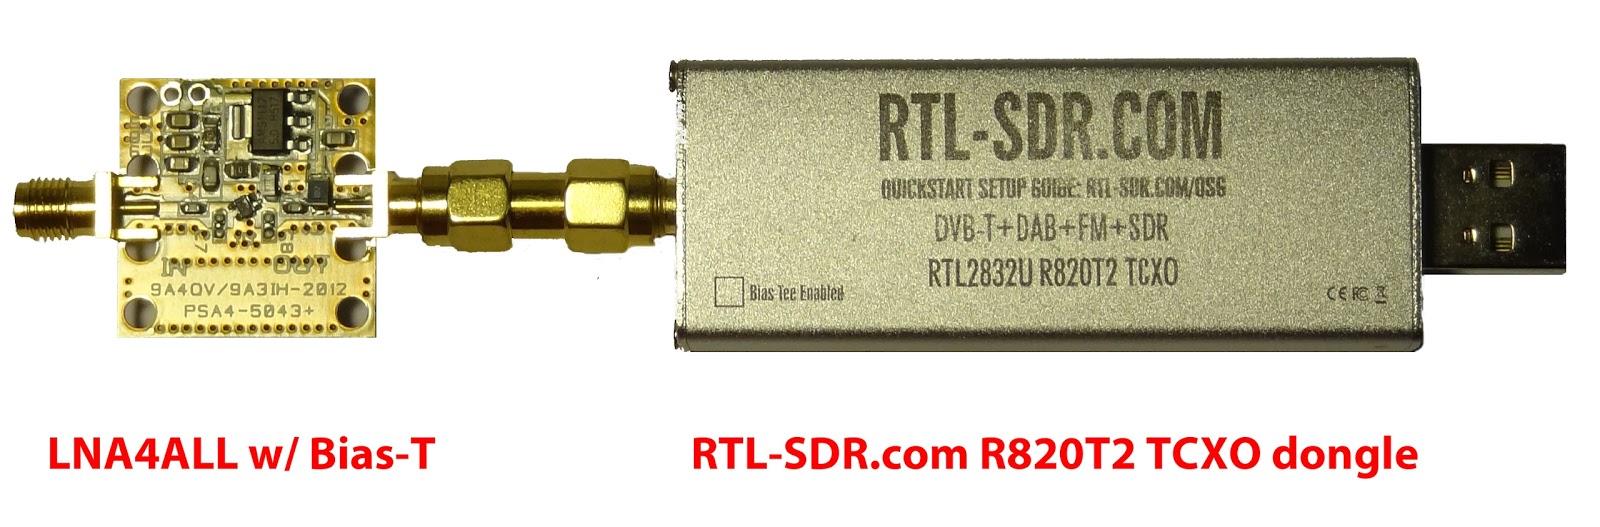 RTL-SDR.com dongle + an LNA4ALL